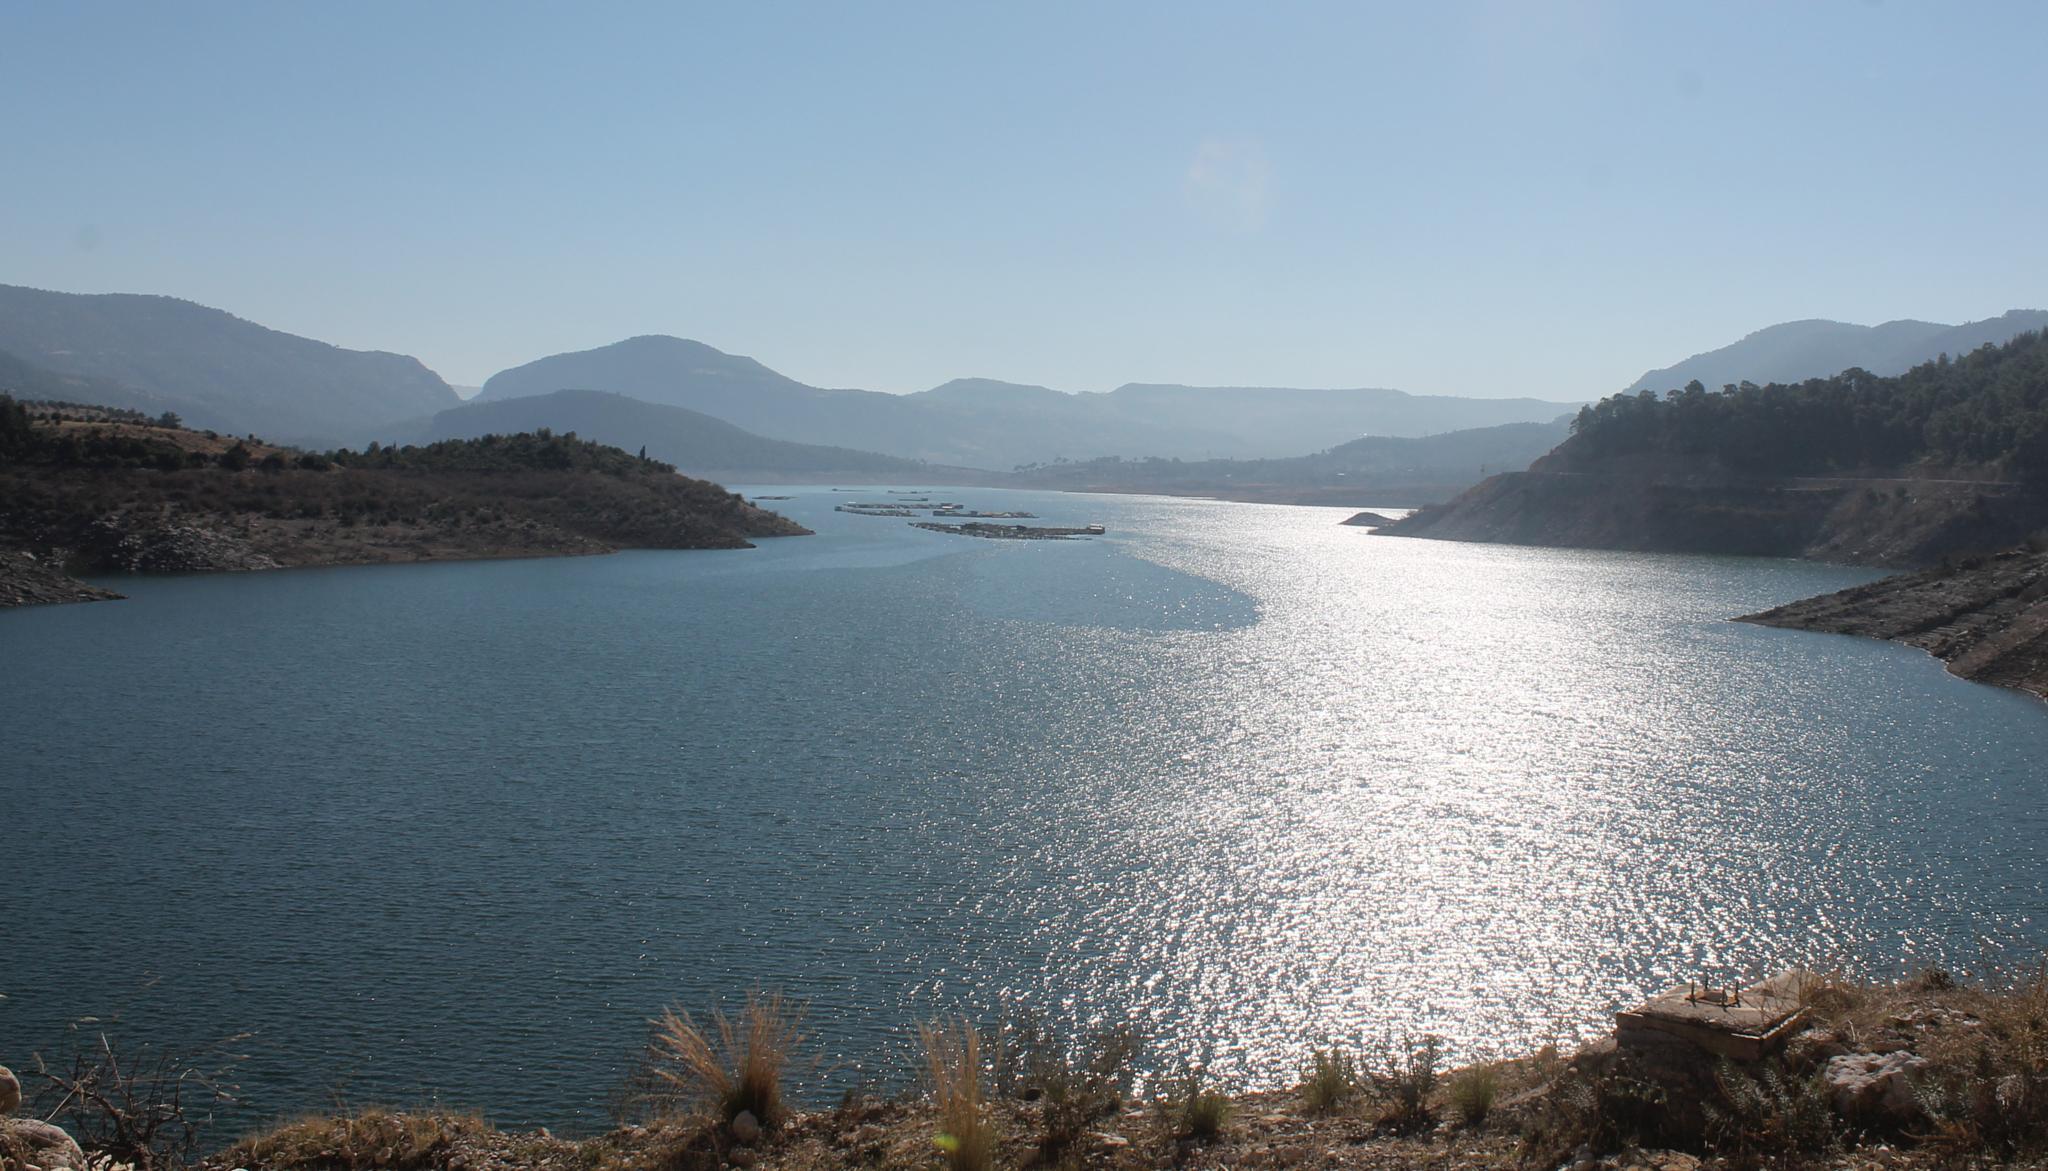 lake of kemer bent  by Ayberk SOYLU